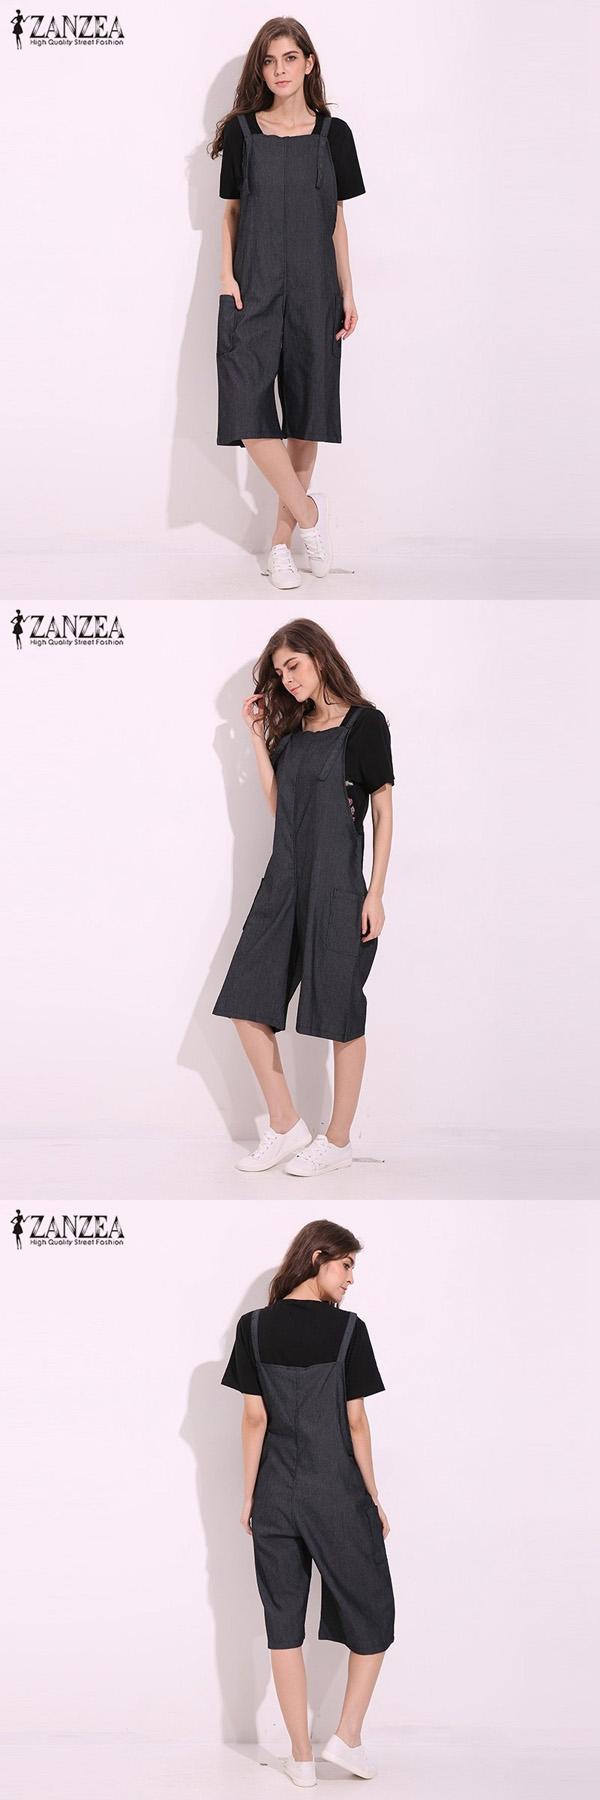 Best dress pants material for summer